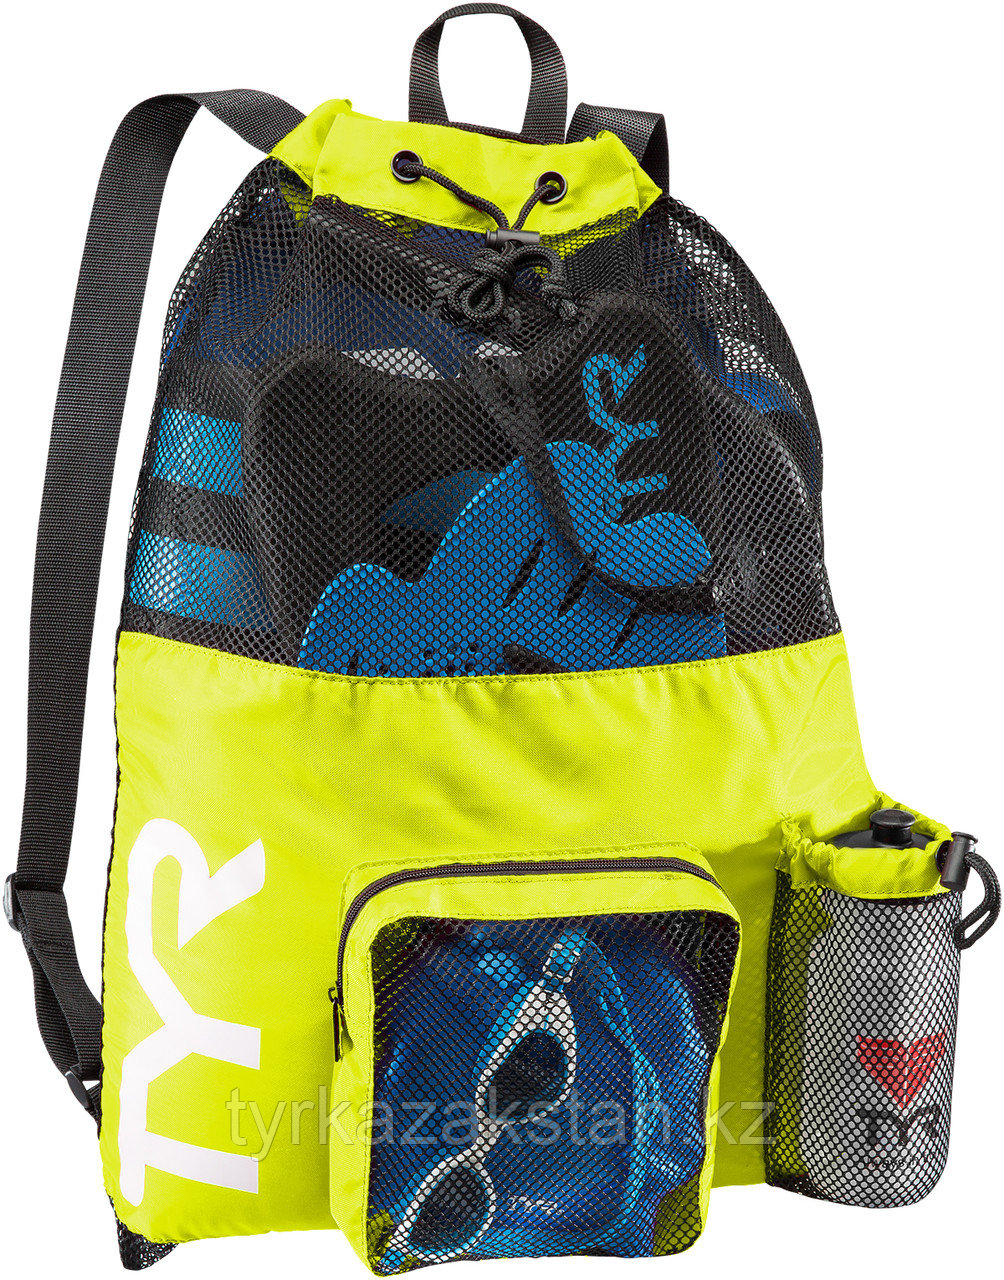 Рюкзак для аксессуаров TYR Big Mesh Mummy Backpack 730